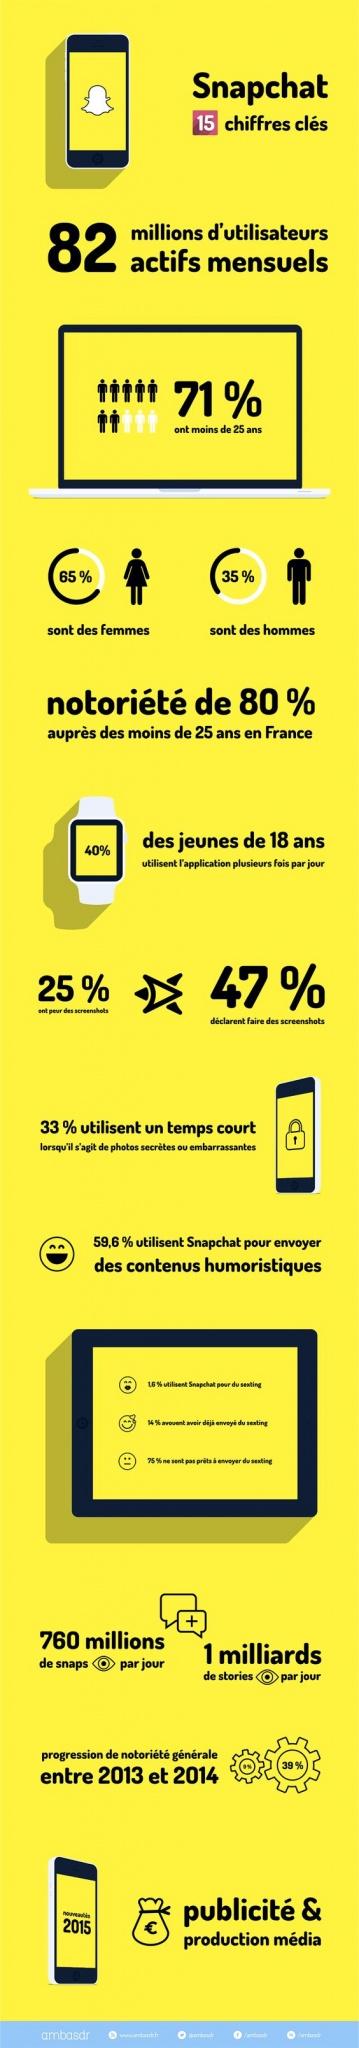 infographoe-snapchat-ambasadr